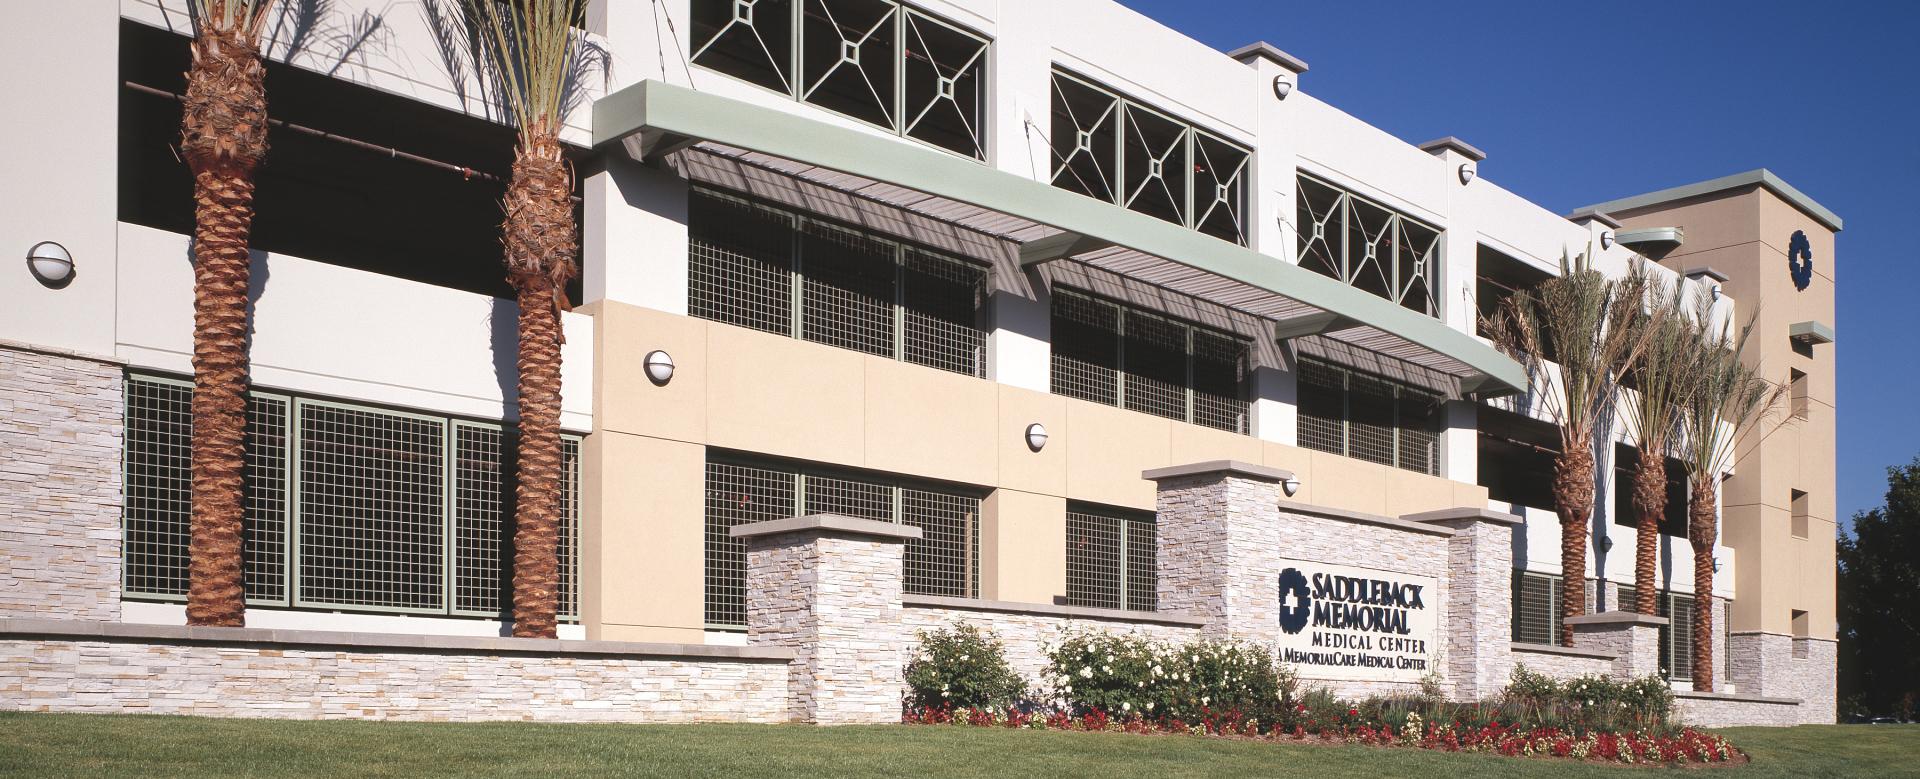 Saddleback Memorial Medical Center